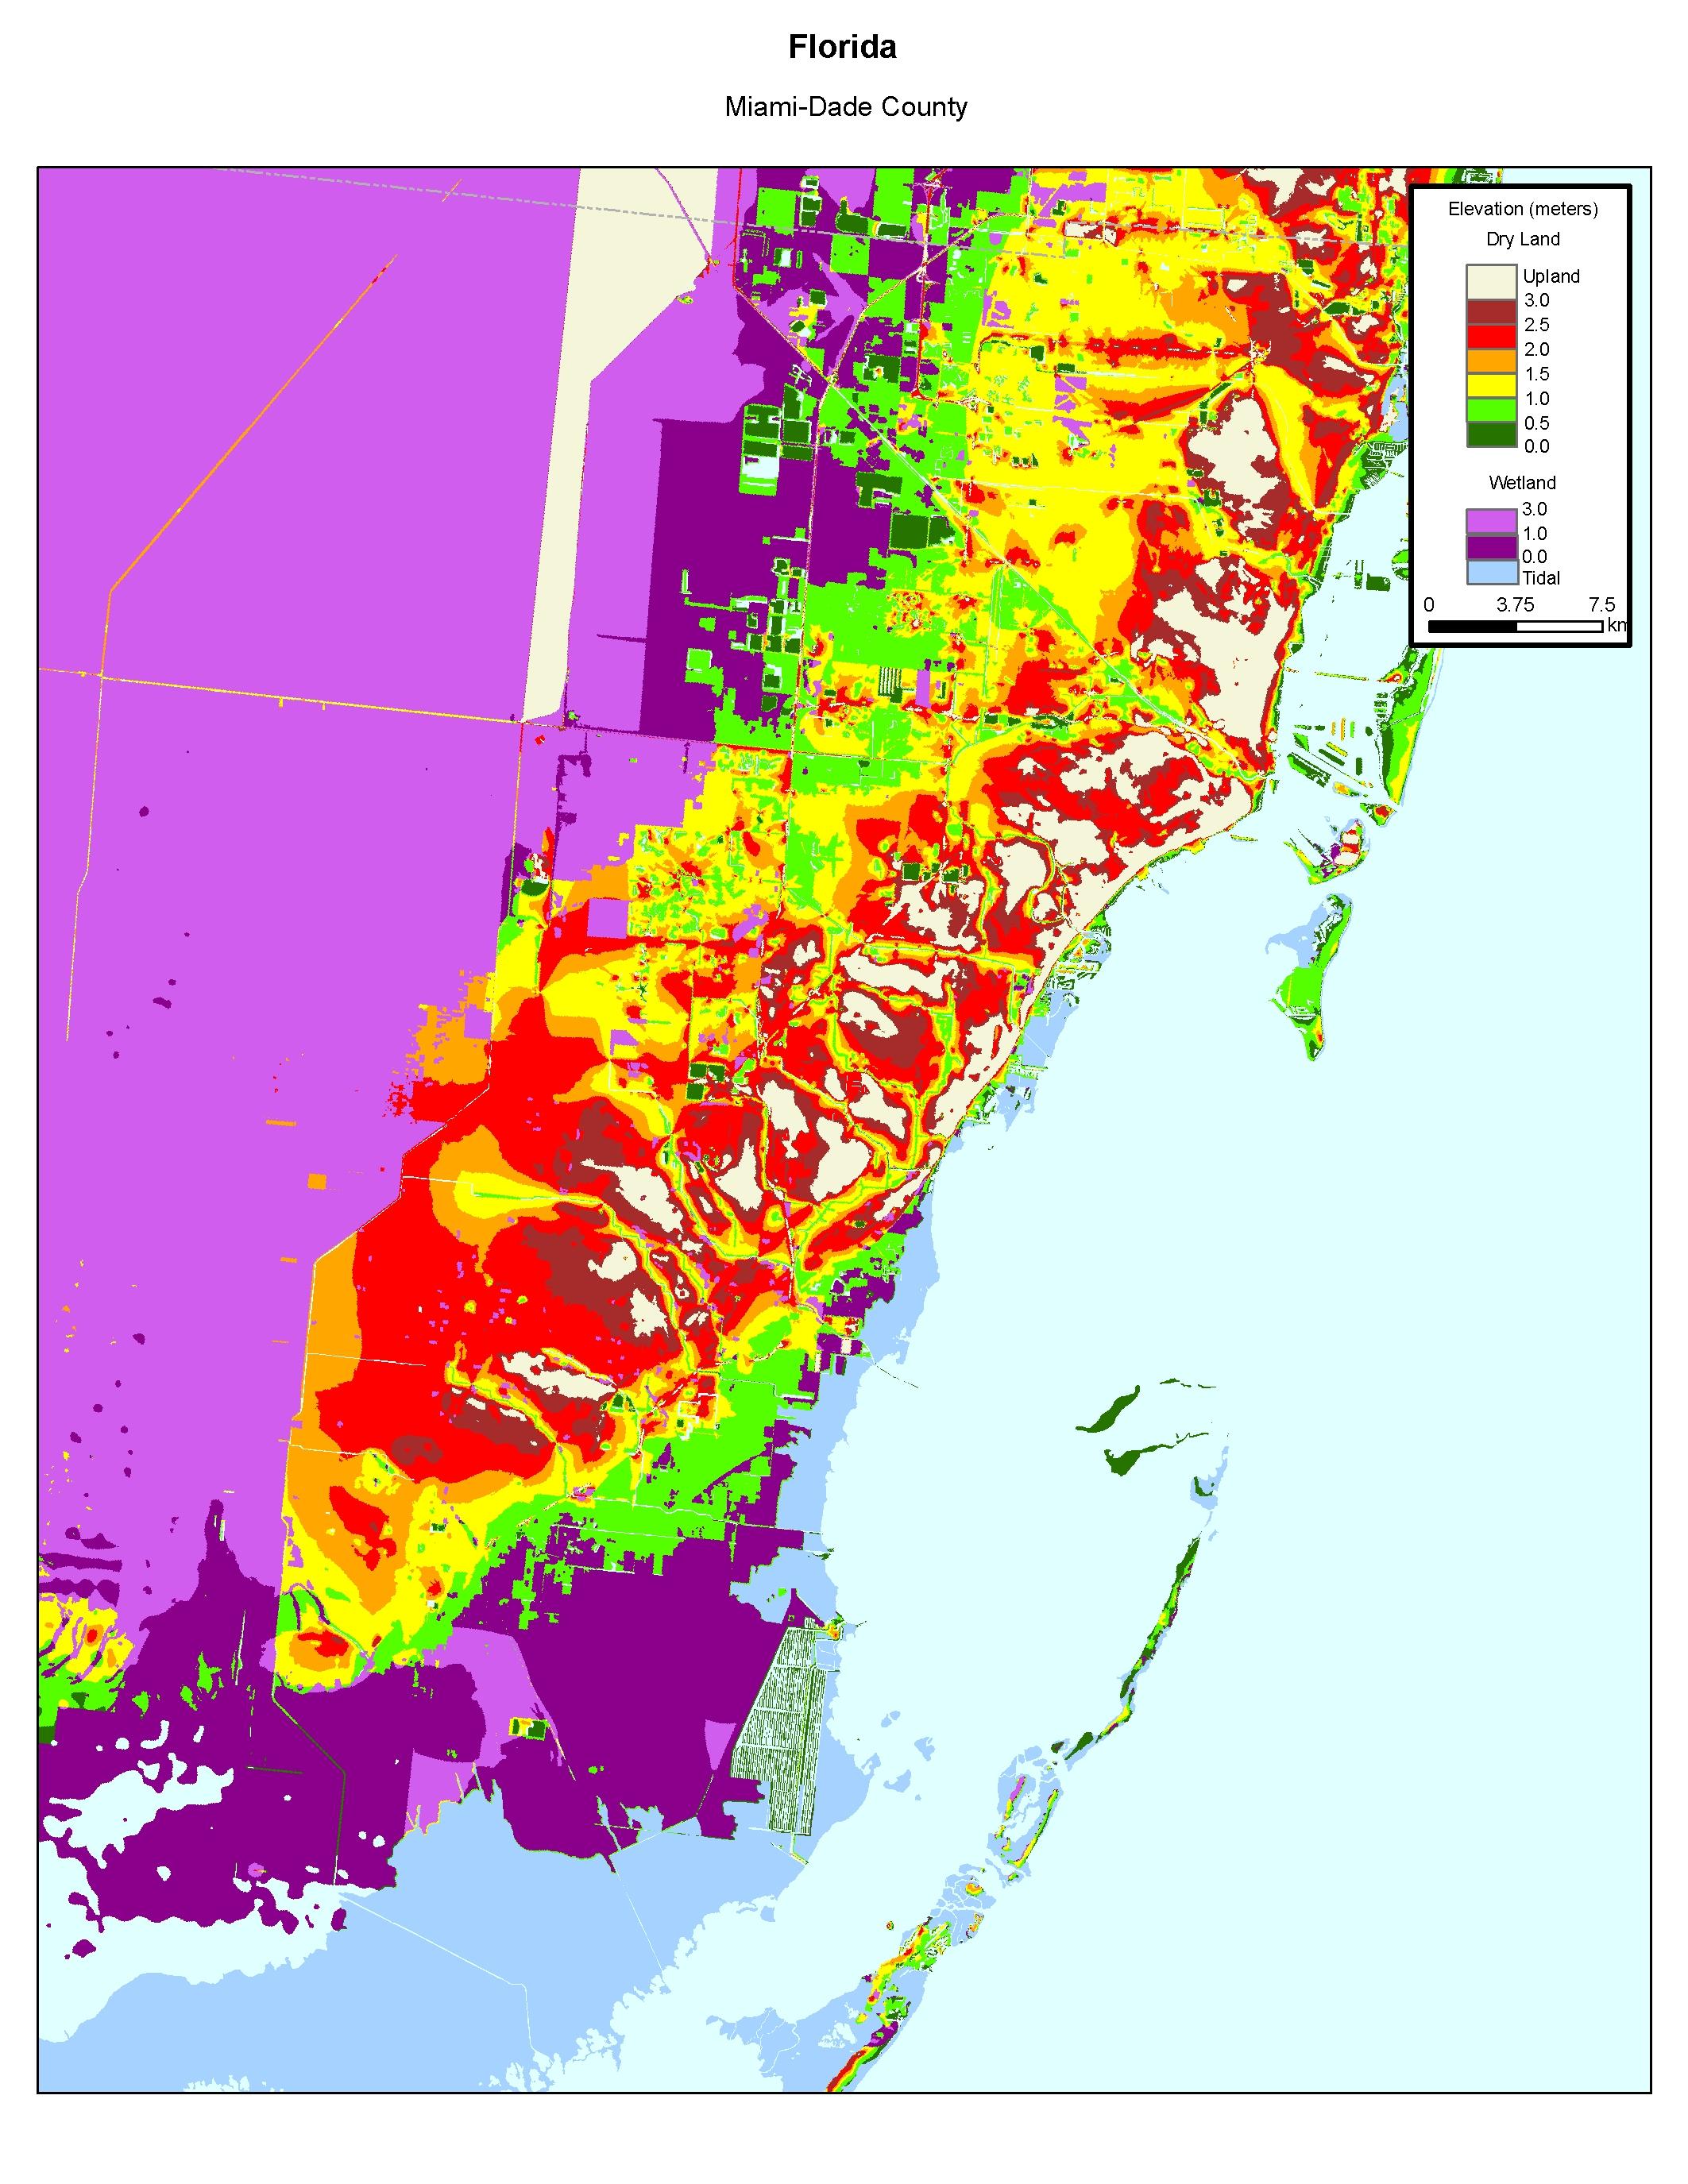 More Sea Level Rise Maps Of Florida's Atlantic Coast - Florida Elevation Map By Address